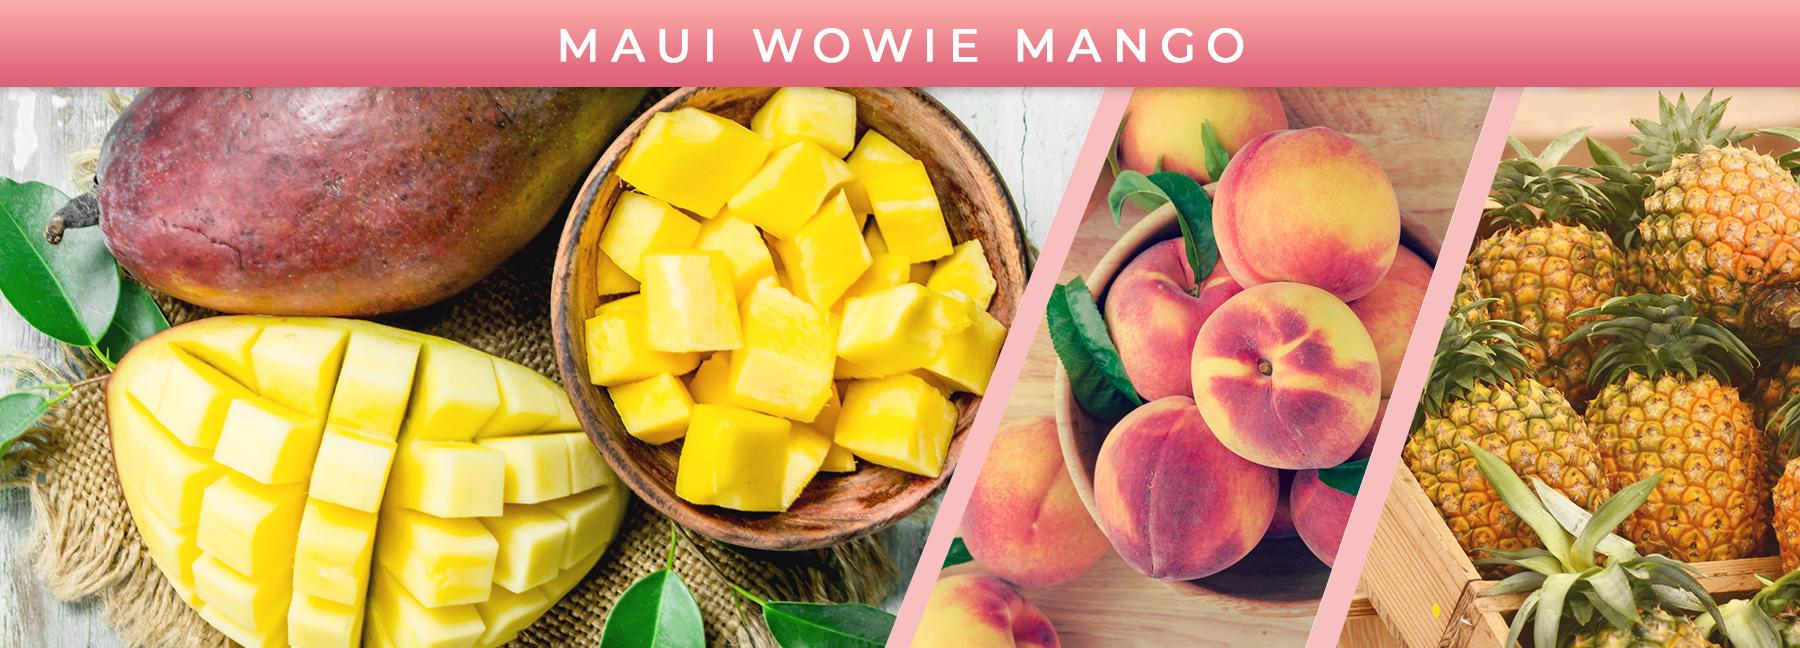 Maui Wowie Mango fragrance elements